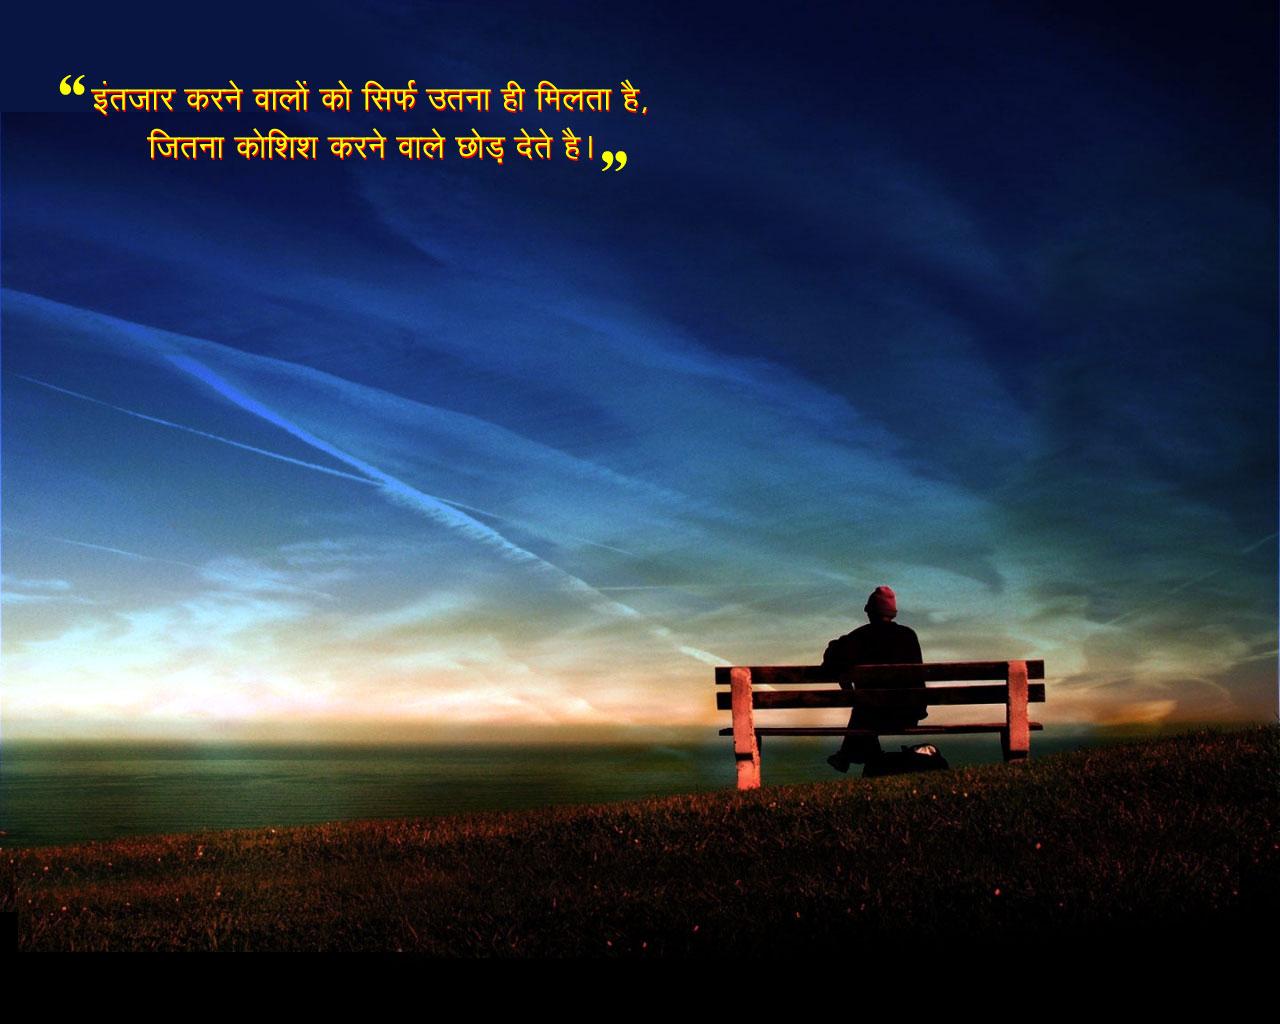 Aaj Ka Vichar In Hindi Wallpapers Free Download